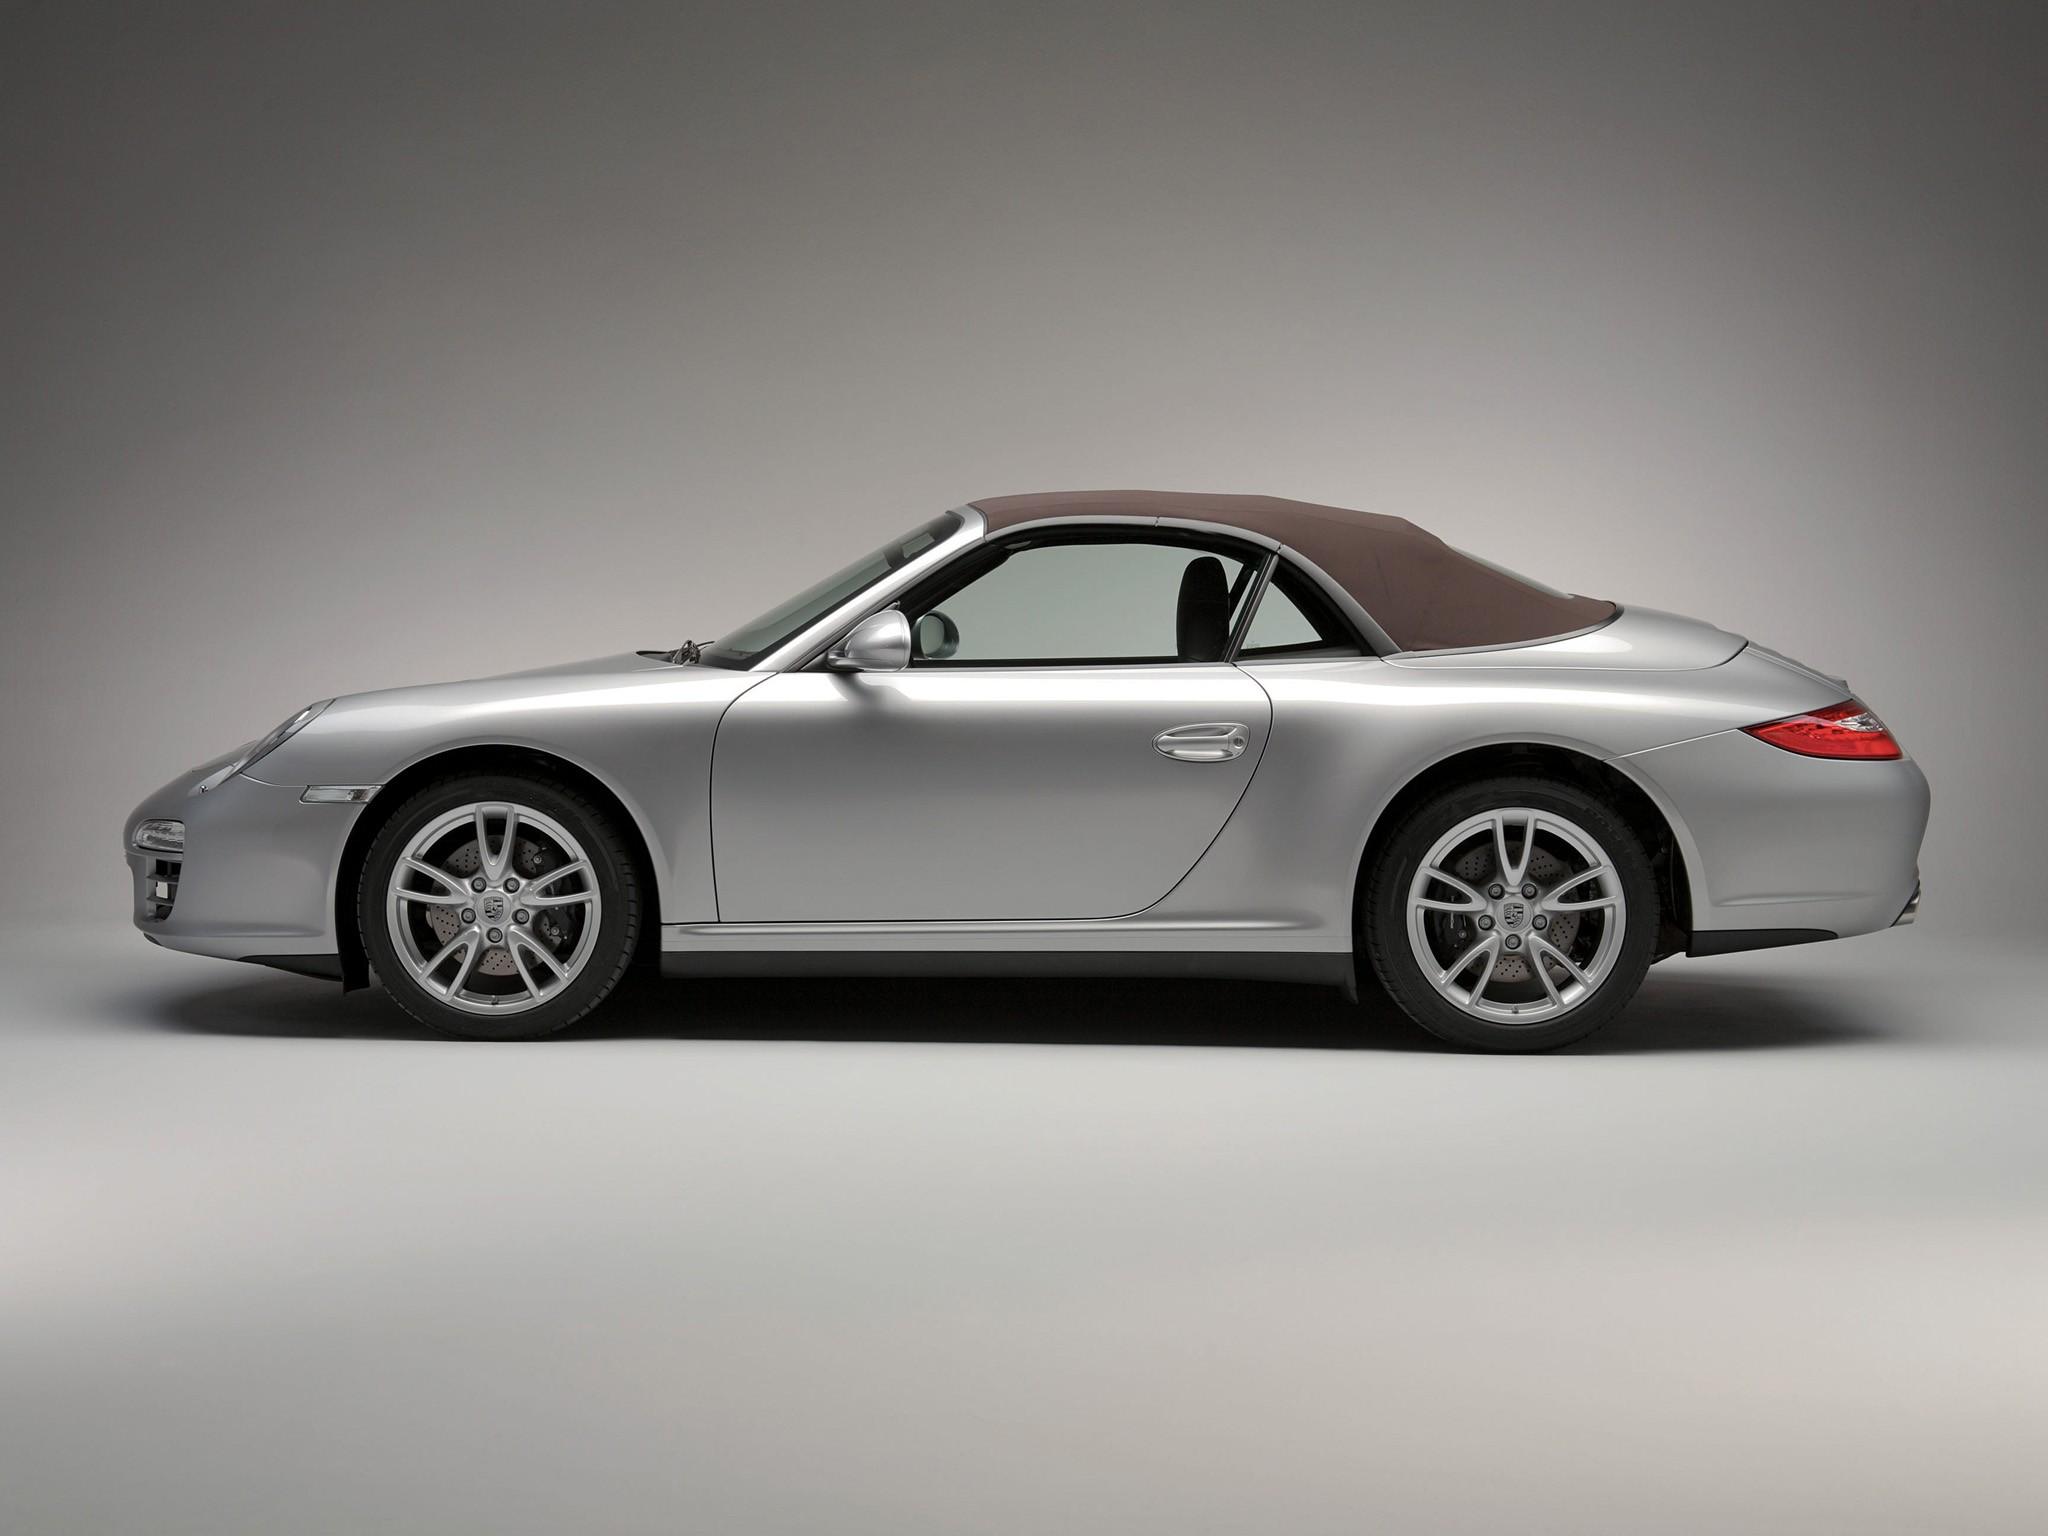 Porsche 911 Carrera 4 Cabriolet 997 Specs 2008 2009